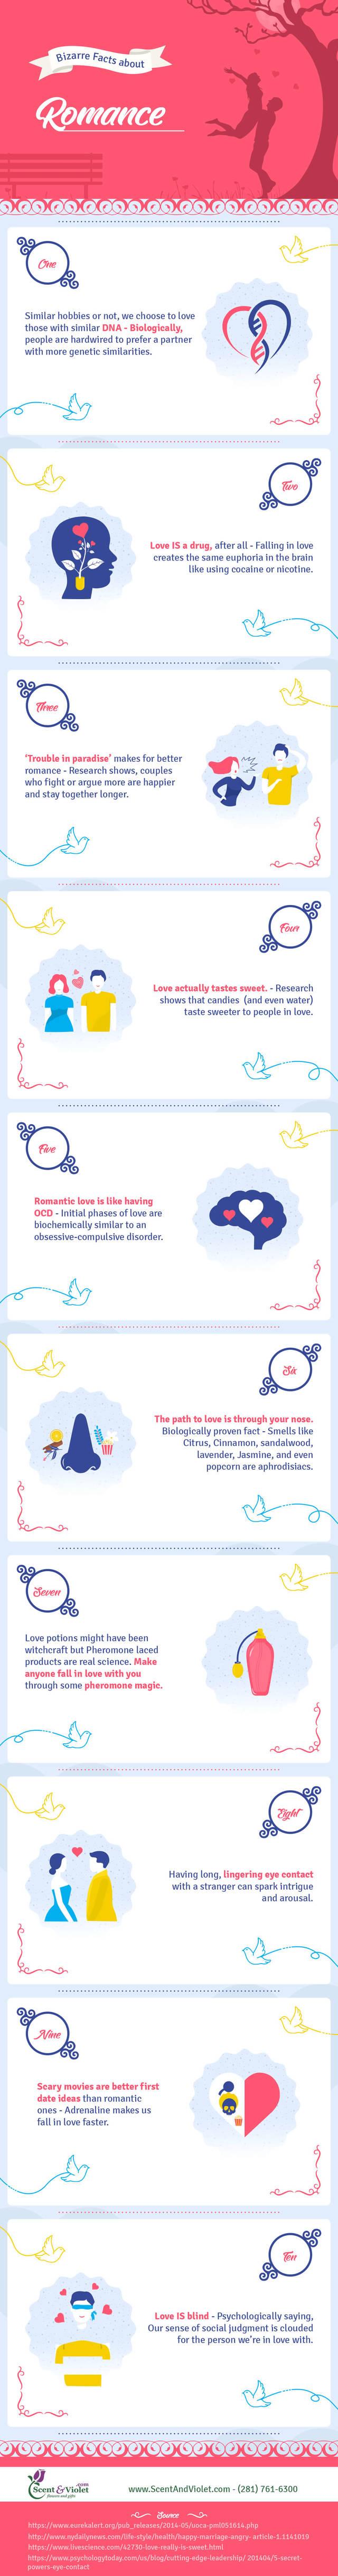 Bizarre facts about romance